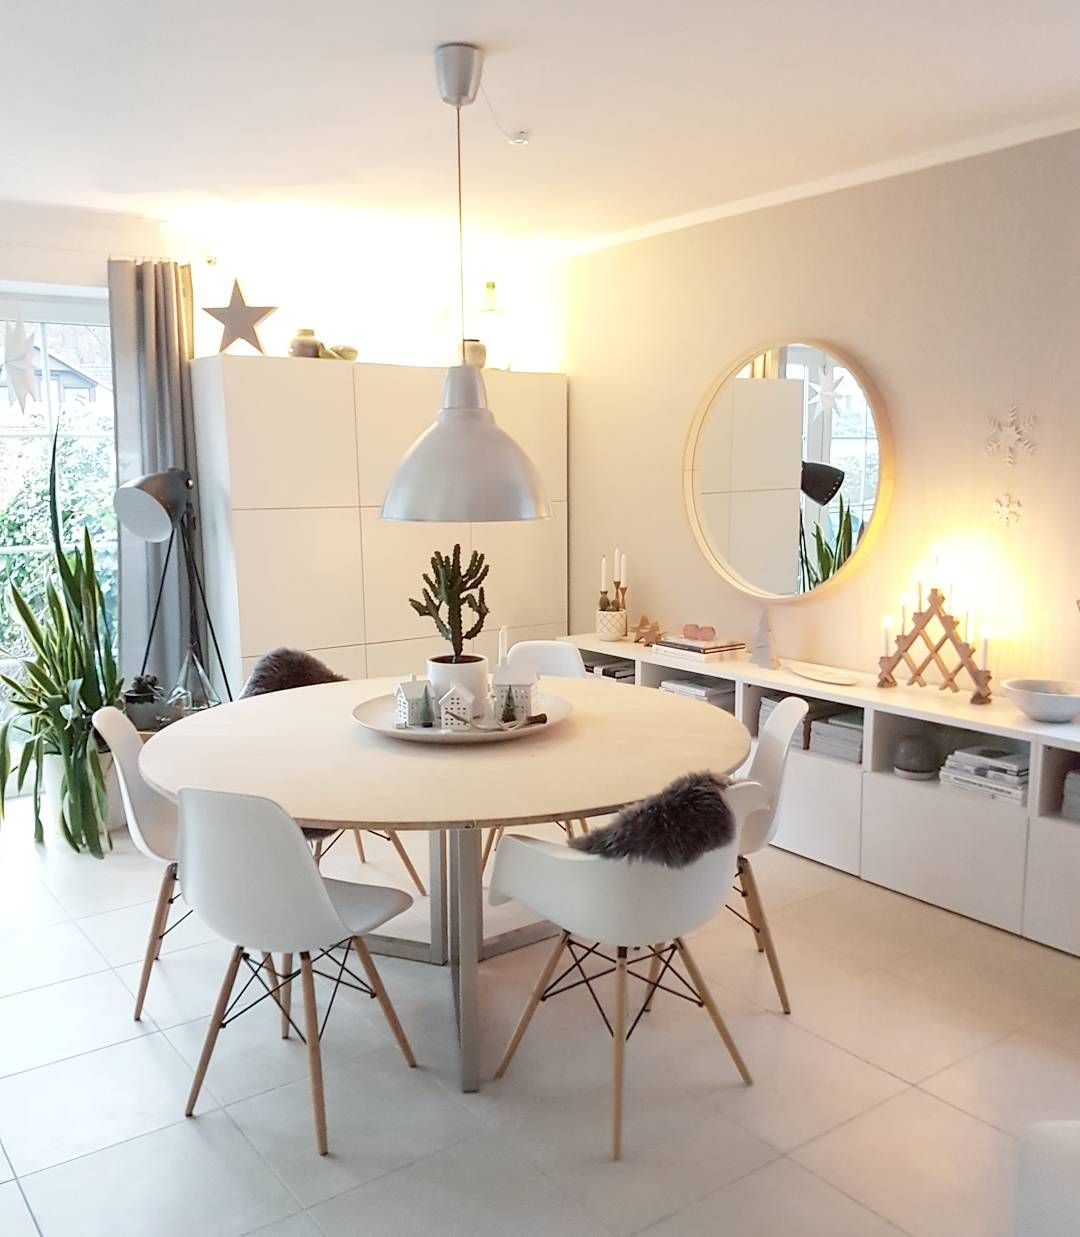 guten morgen fotow nde pinterest home classic dining room und home decor. Black Bedroom Furniture Sets. Home Design Ideas